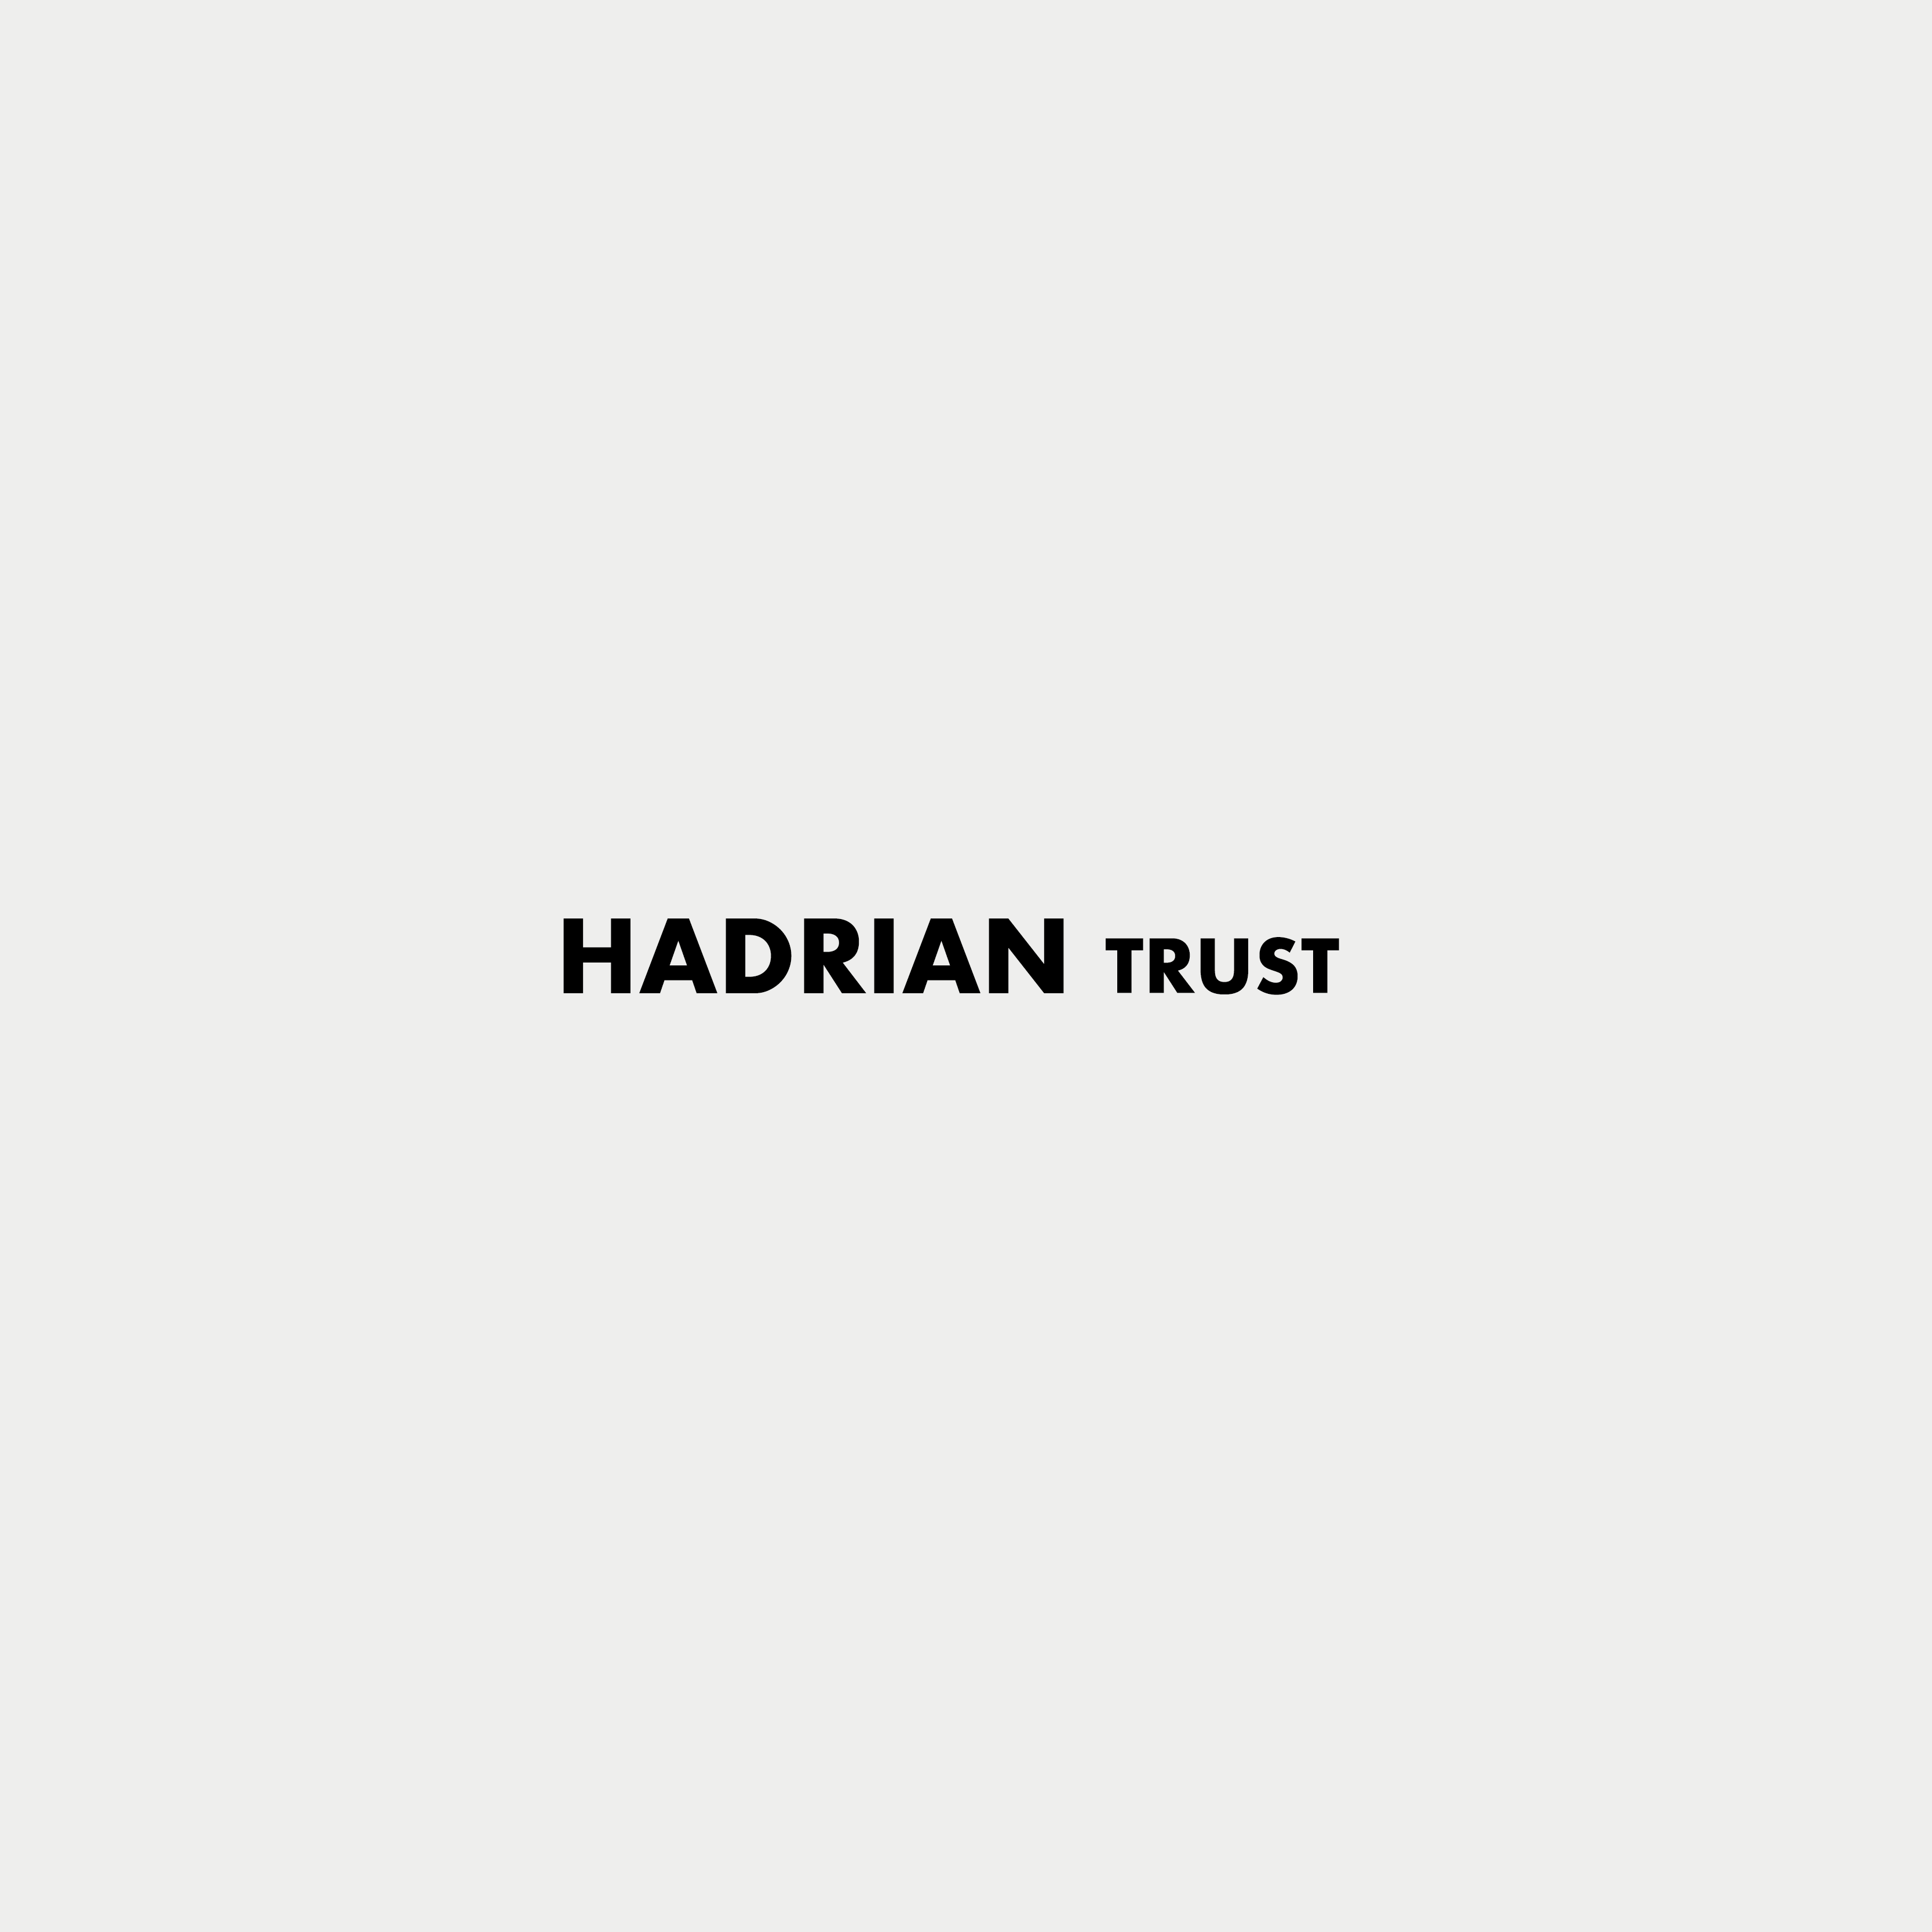 Hadrian Trust Logo